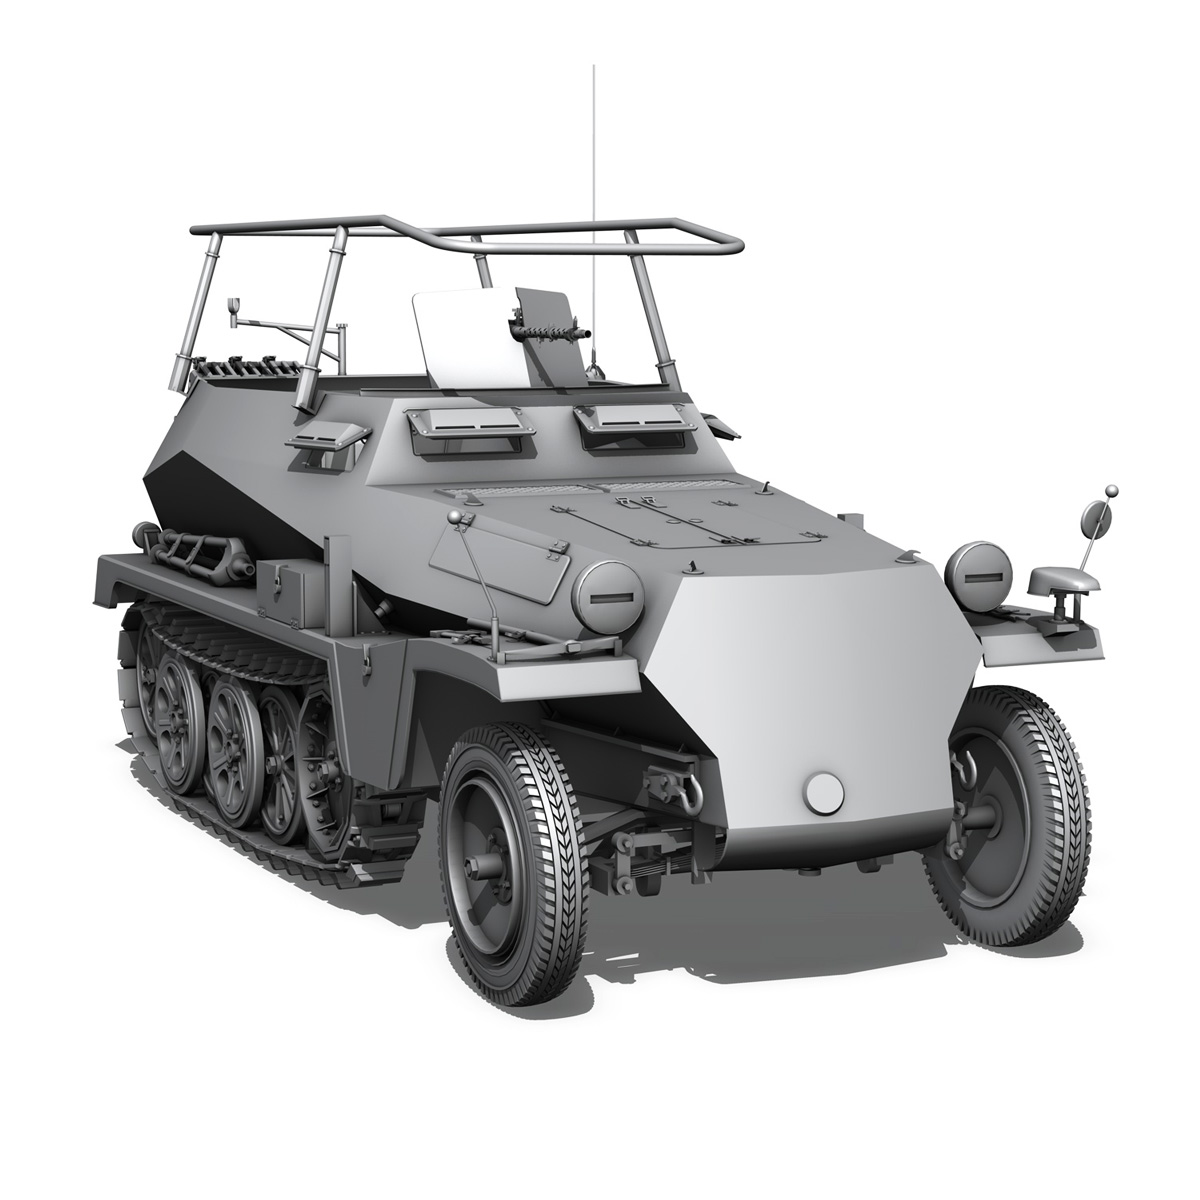 sdkfz 250 – command halftrack 3d model 3ds fbx c4d lwo obj 251675